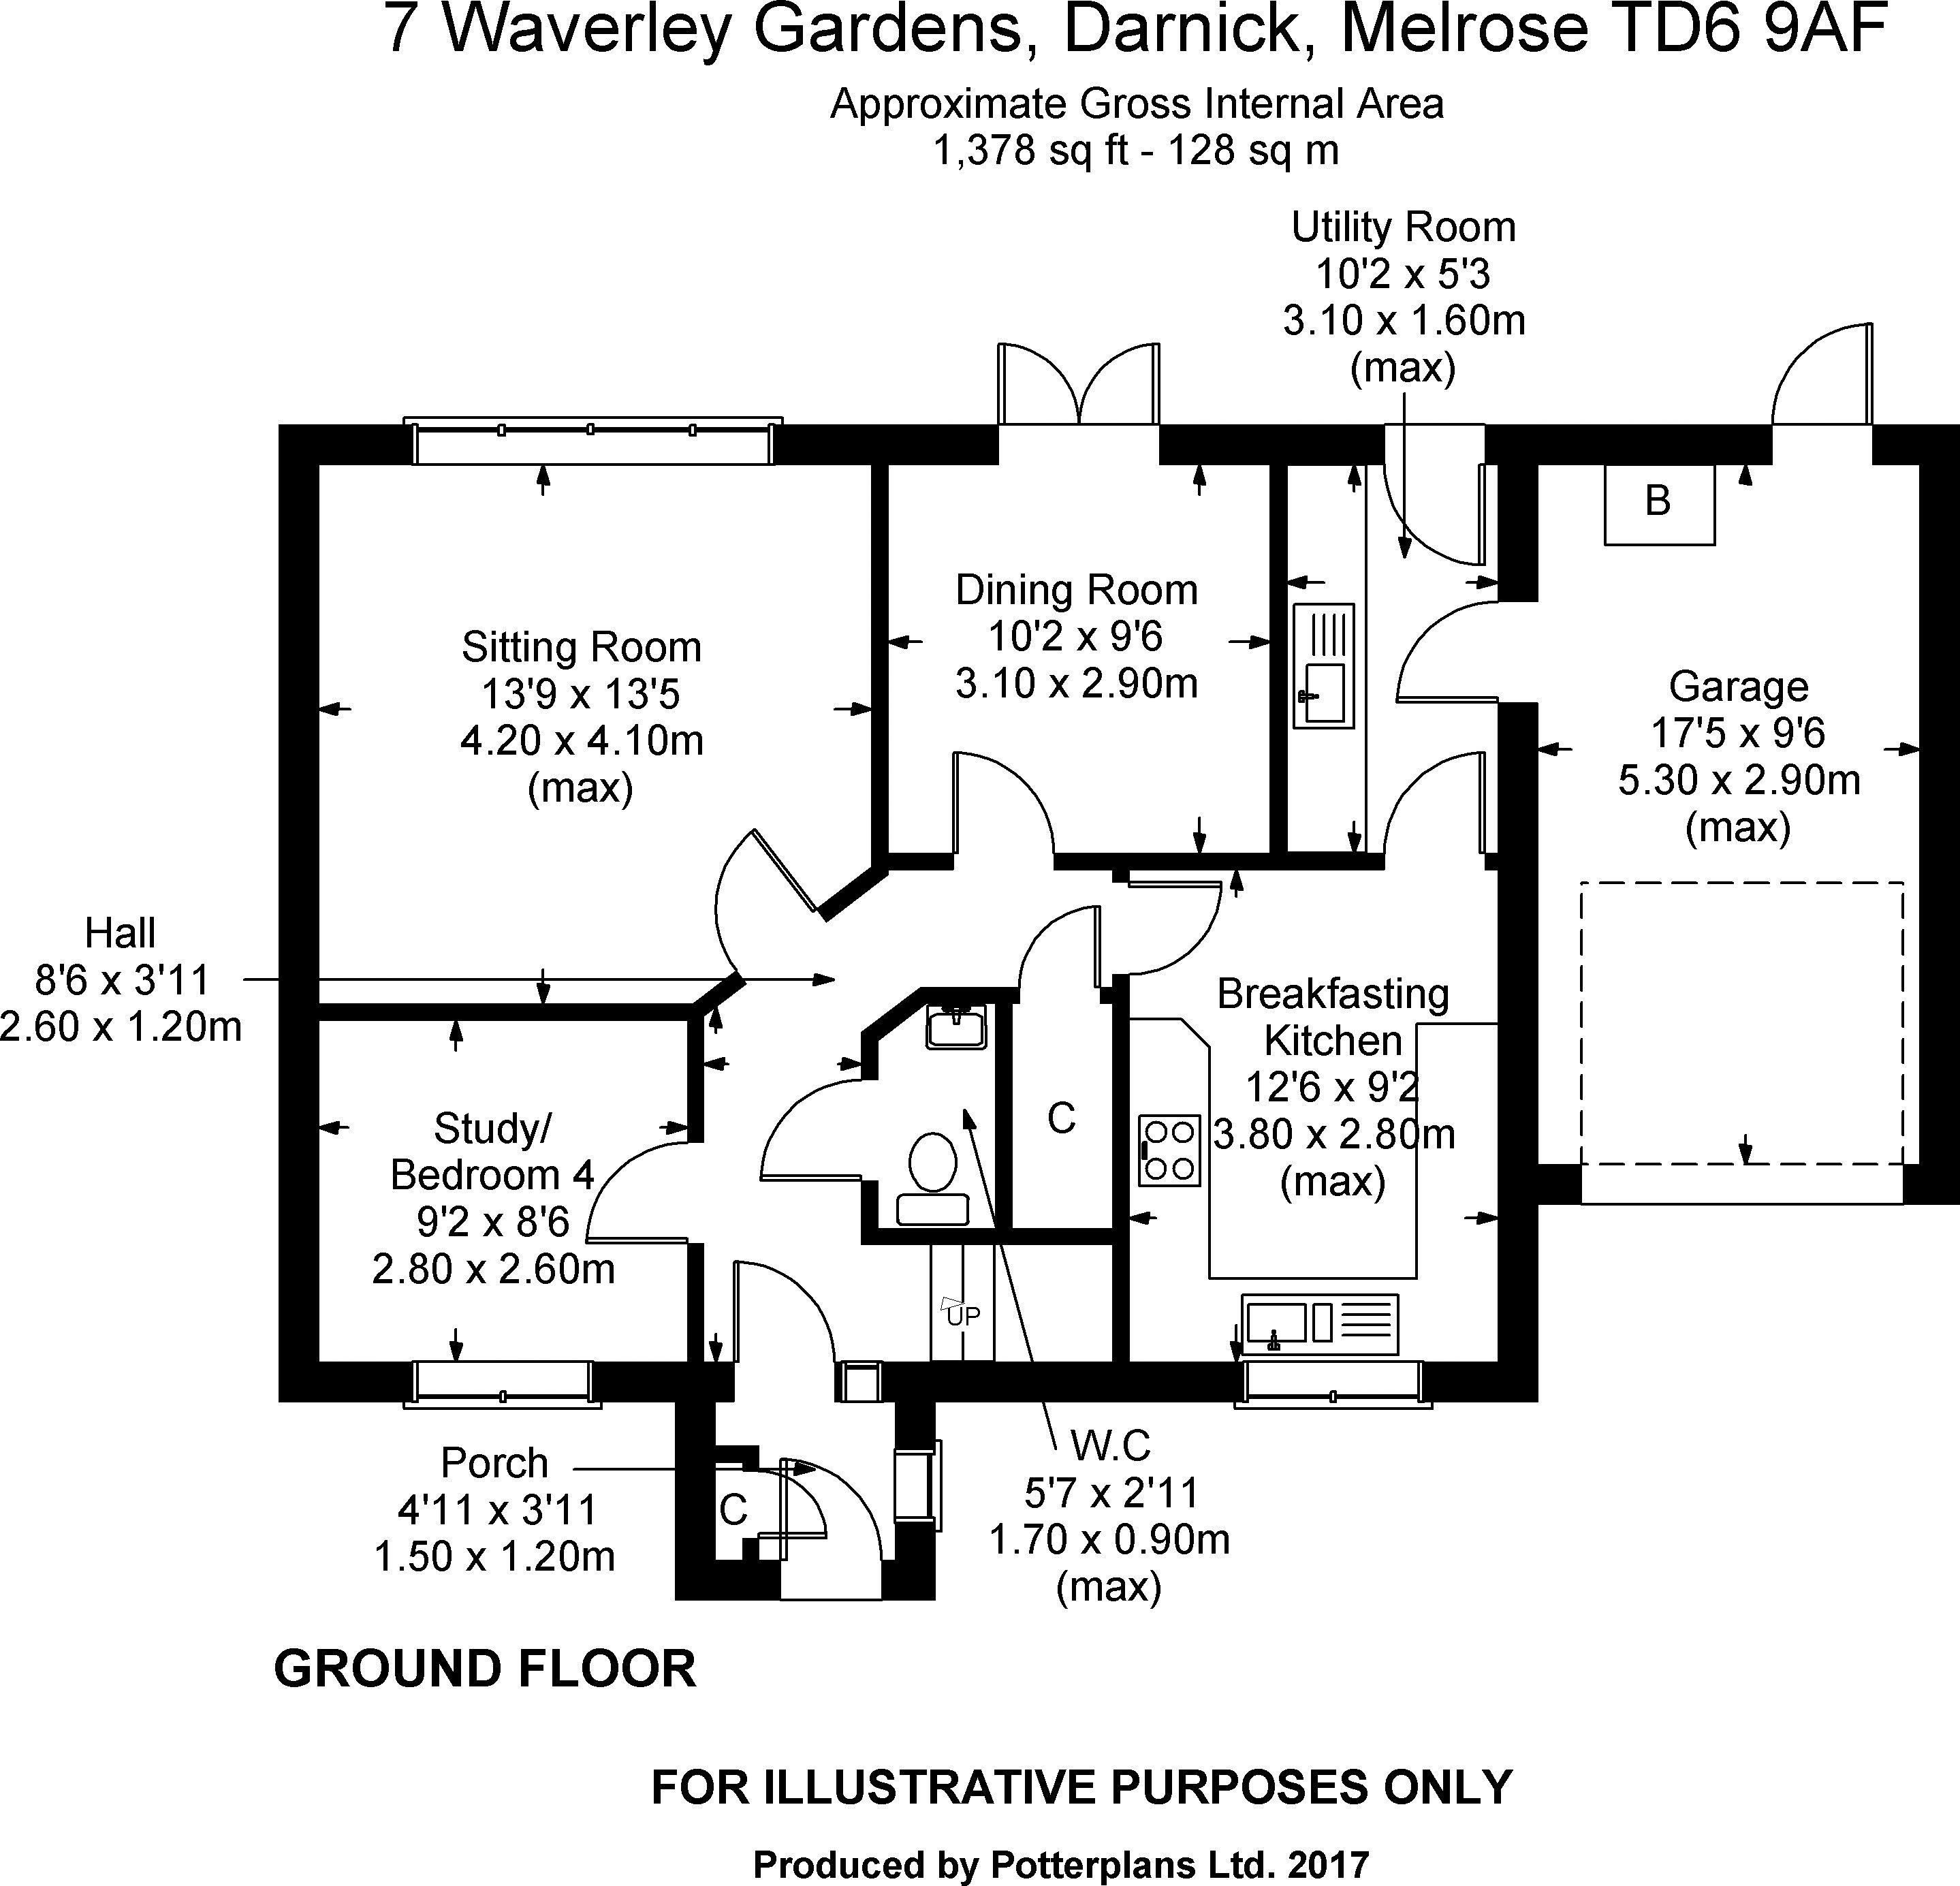 7 Waverley Gardens Ground Floor